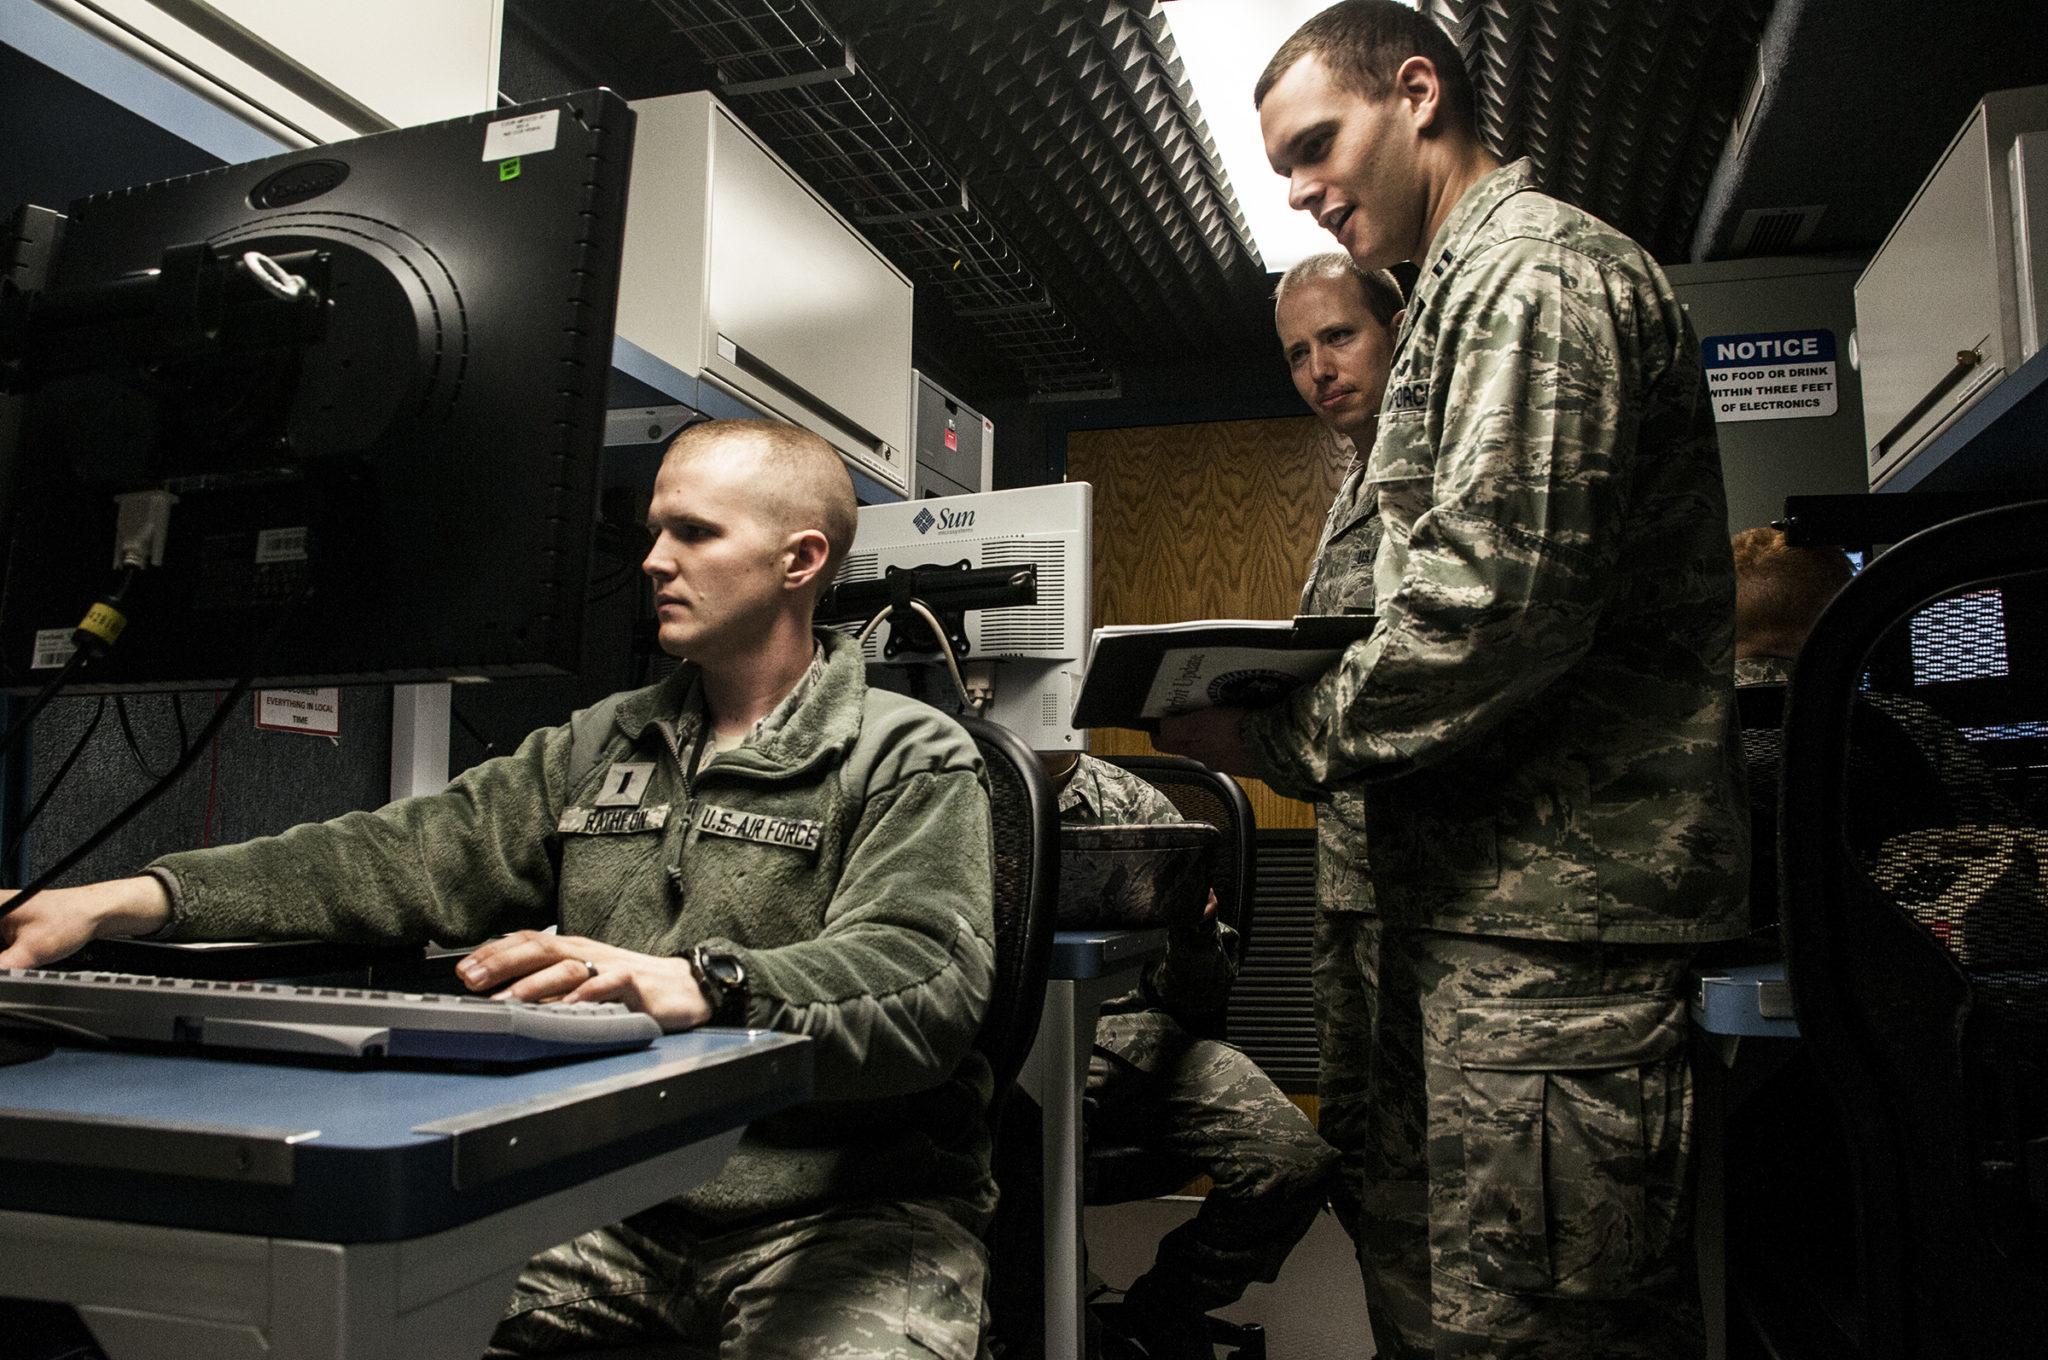 USAF Air Force SMC